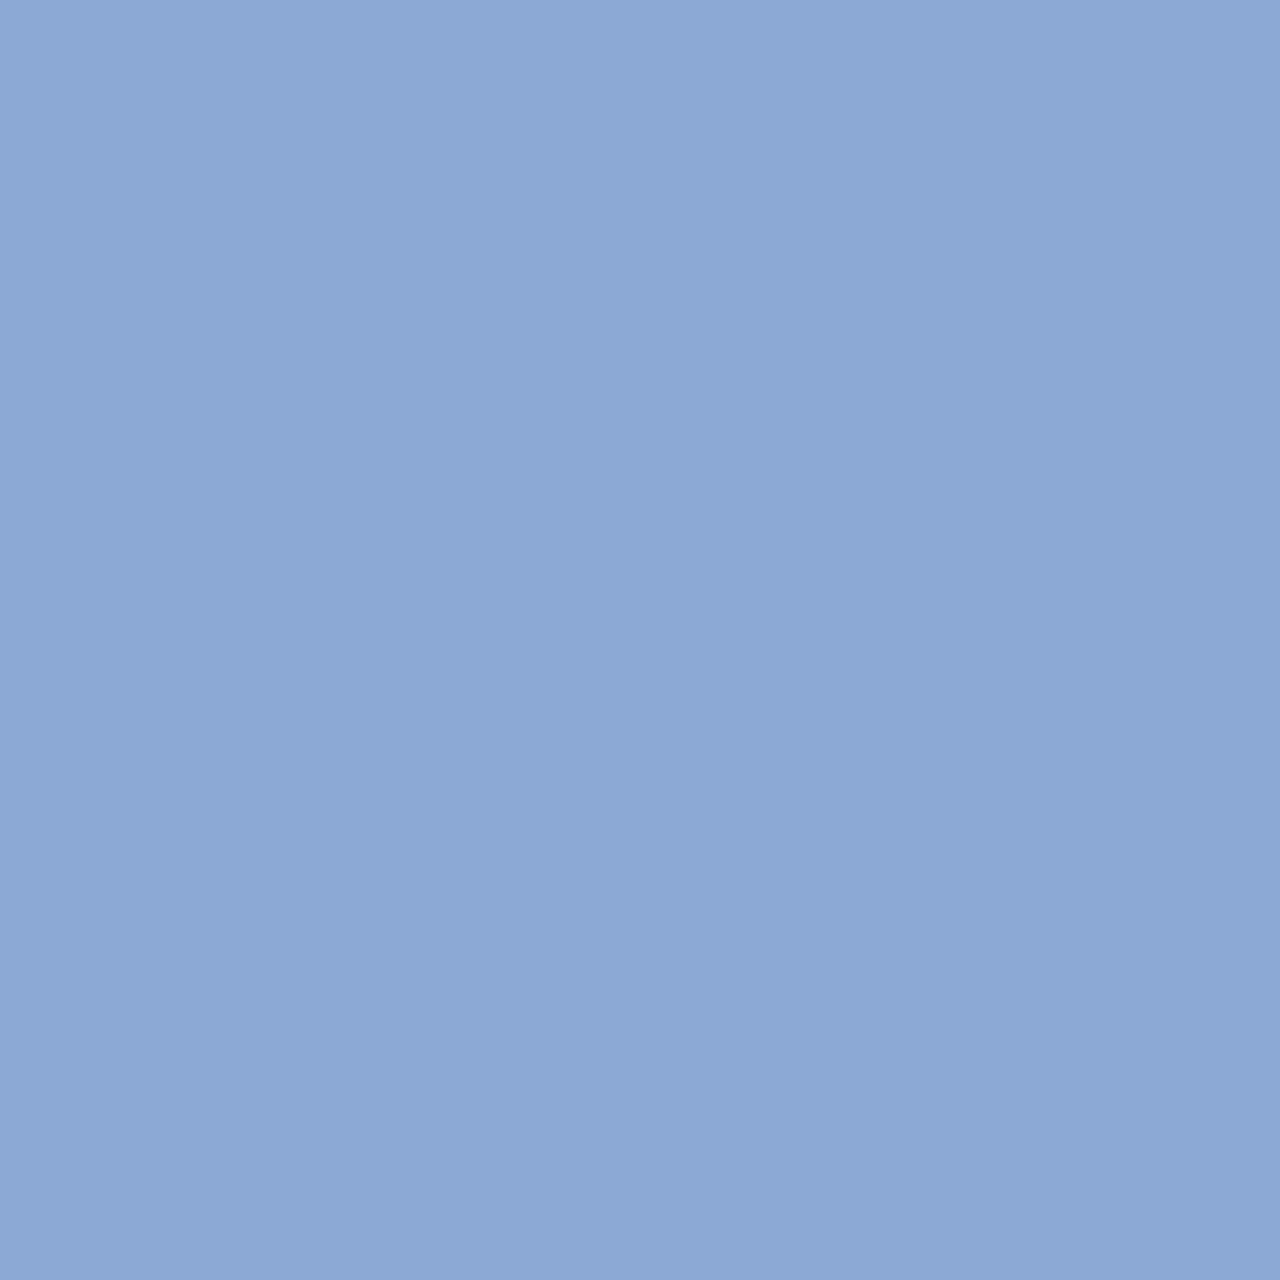 Rosco Cinegel Sheet #3203: Three-Quarter Blue (3/4 CTB), Gels